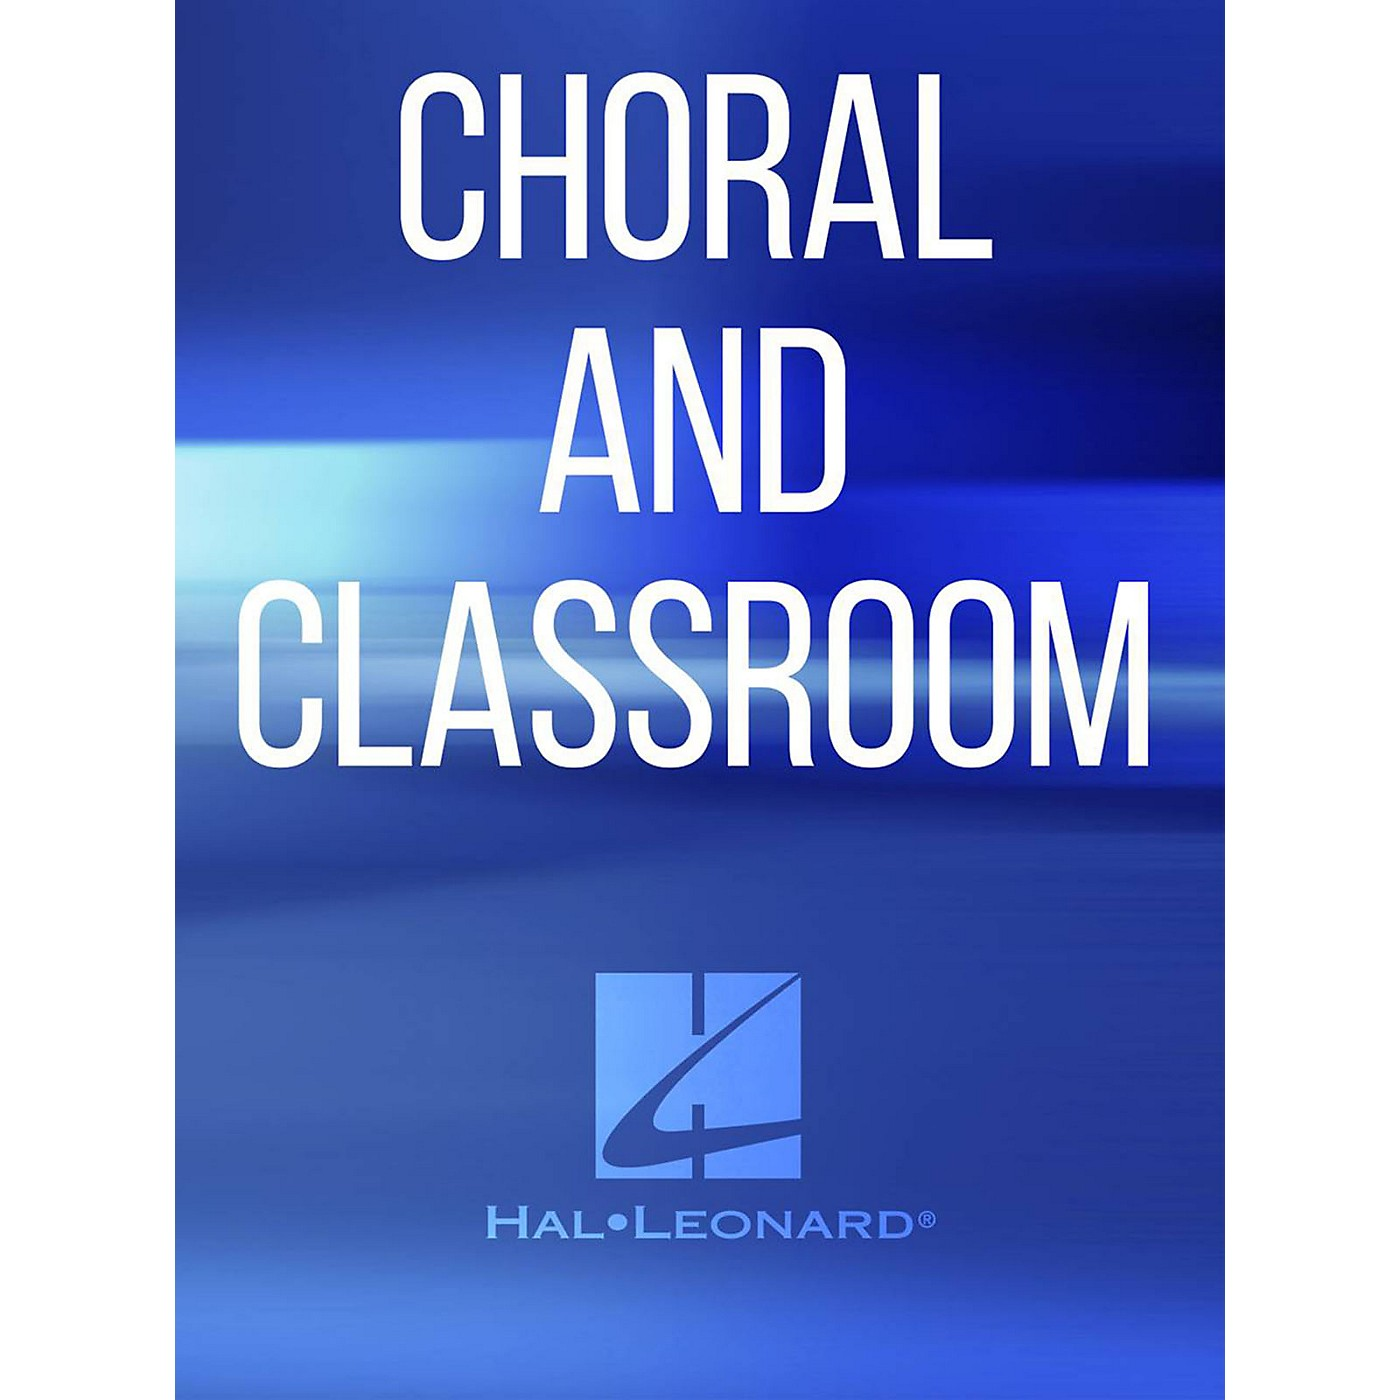 Hal Leonard Sing Praise To God - Mit Freuden Zart SATB Composed by Ken Berg thumbnail